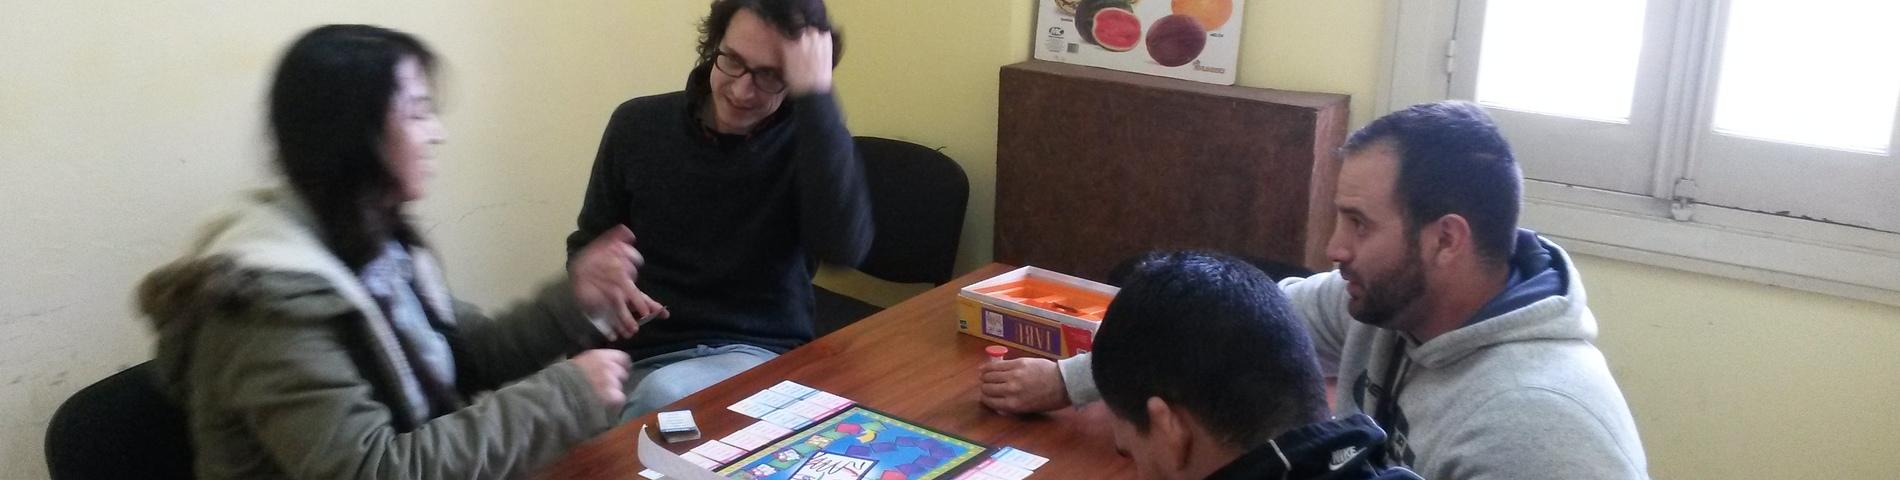 Imatge 1 de l'escola Centro de Enseñanza de Español La Herradura